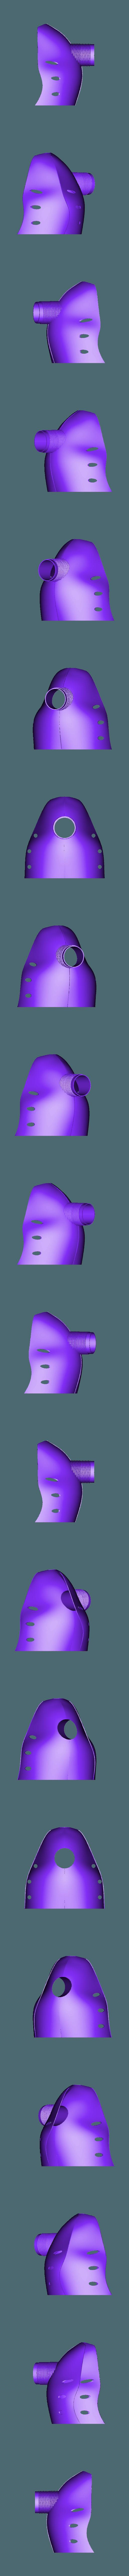 Mascherina_COVID-19_struttura_V2_0.stl Télécharger fichier STL gratuit Mascherina COVID-19 • Design à imprimer en 3D, marcogenito